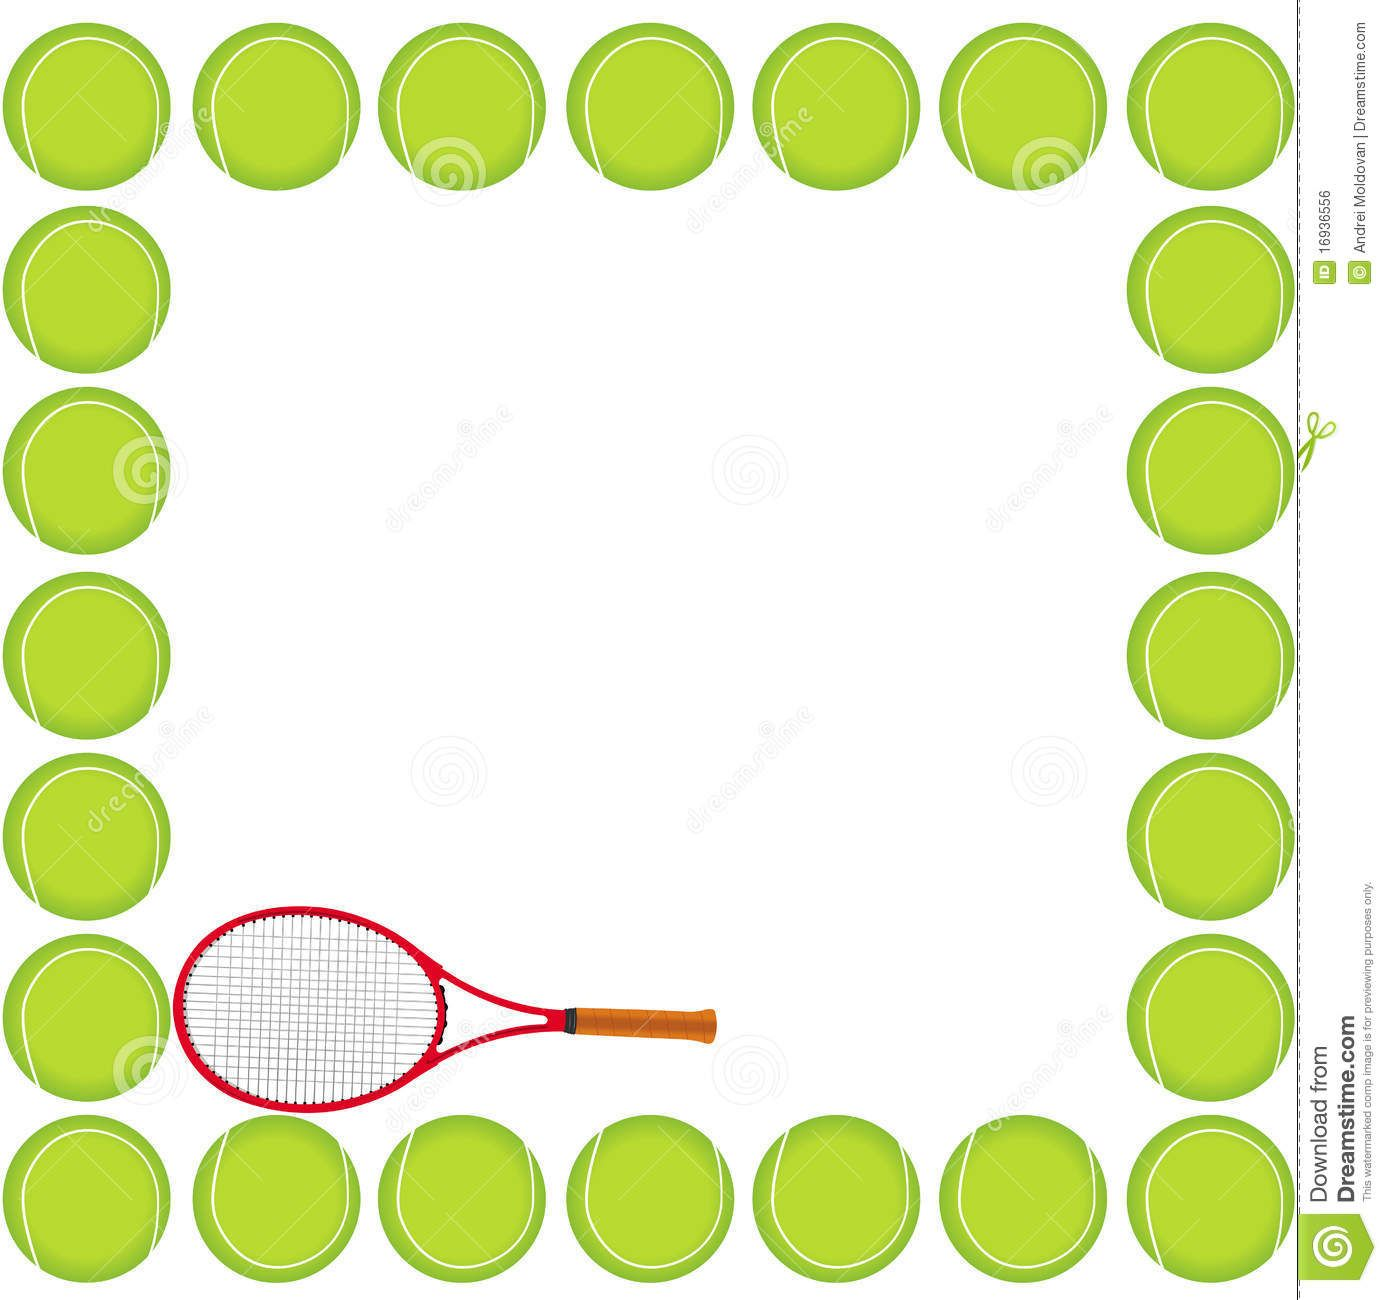 Tennis Border Free Clip Art Google Search Free Clip Art Clip Art Clip Art Borders